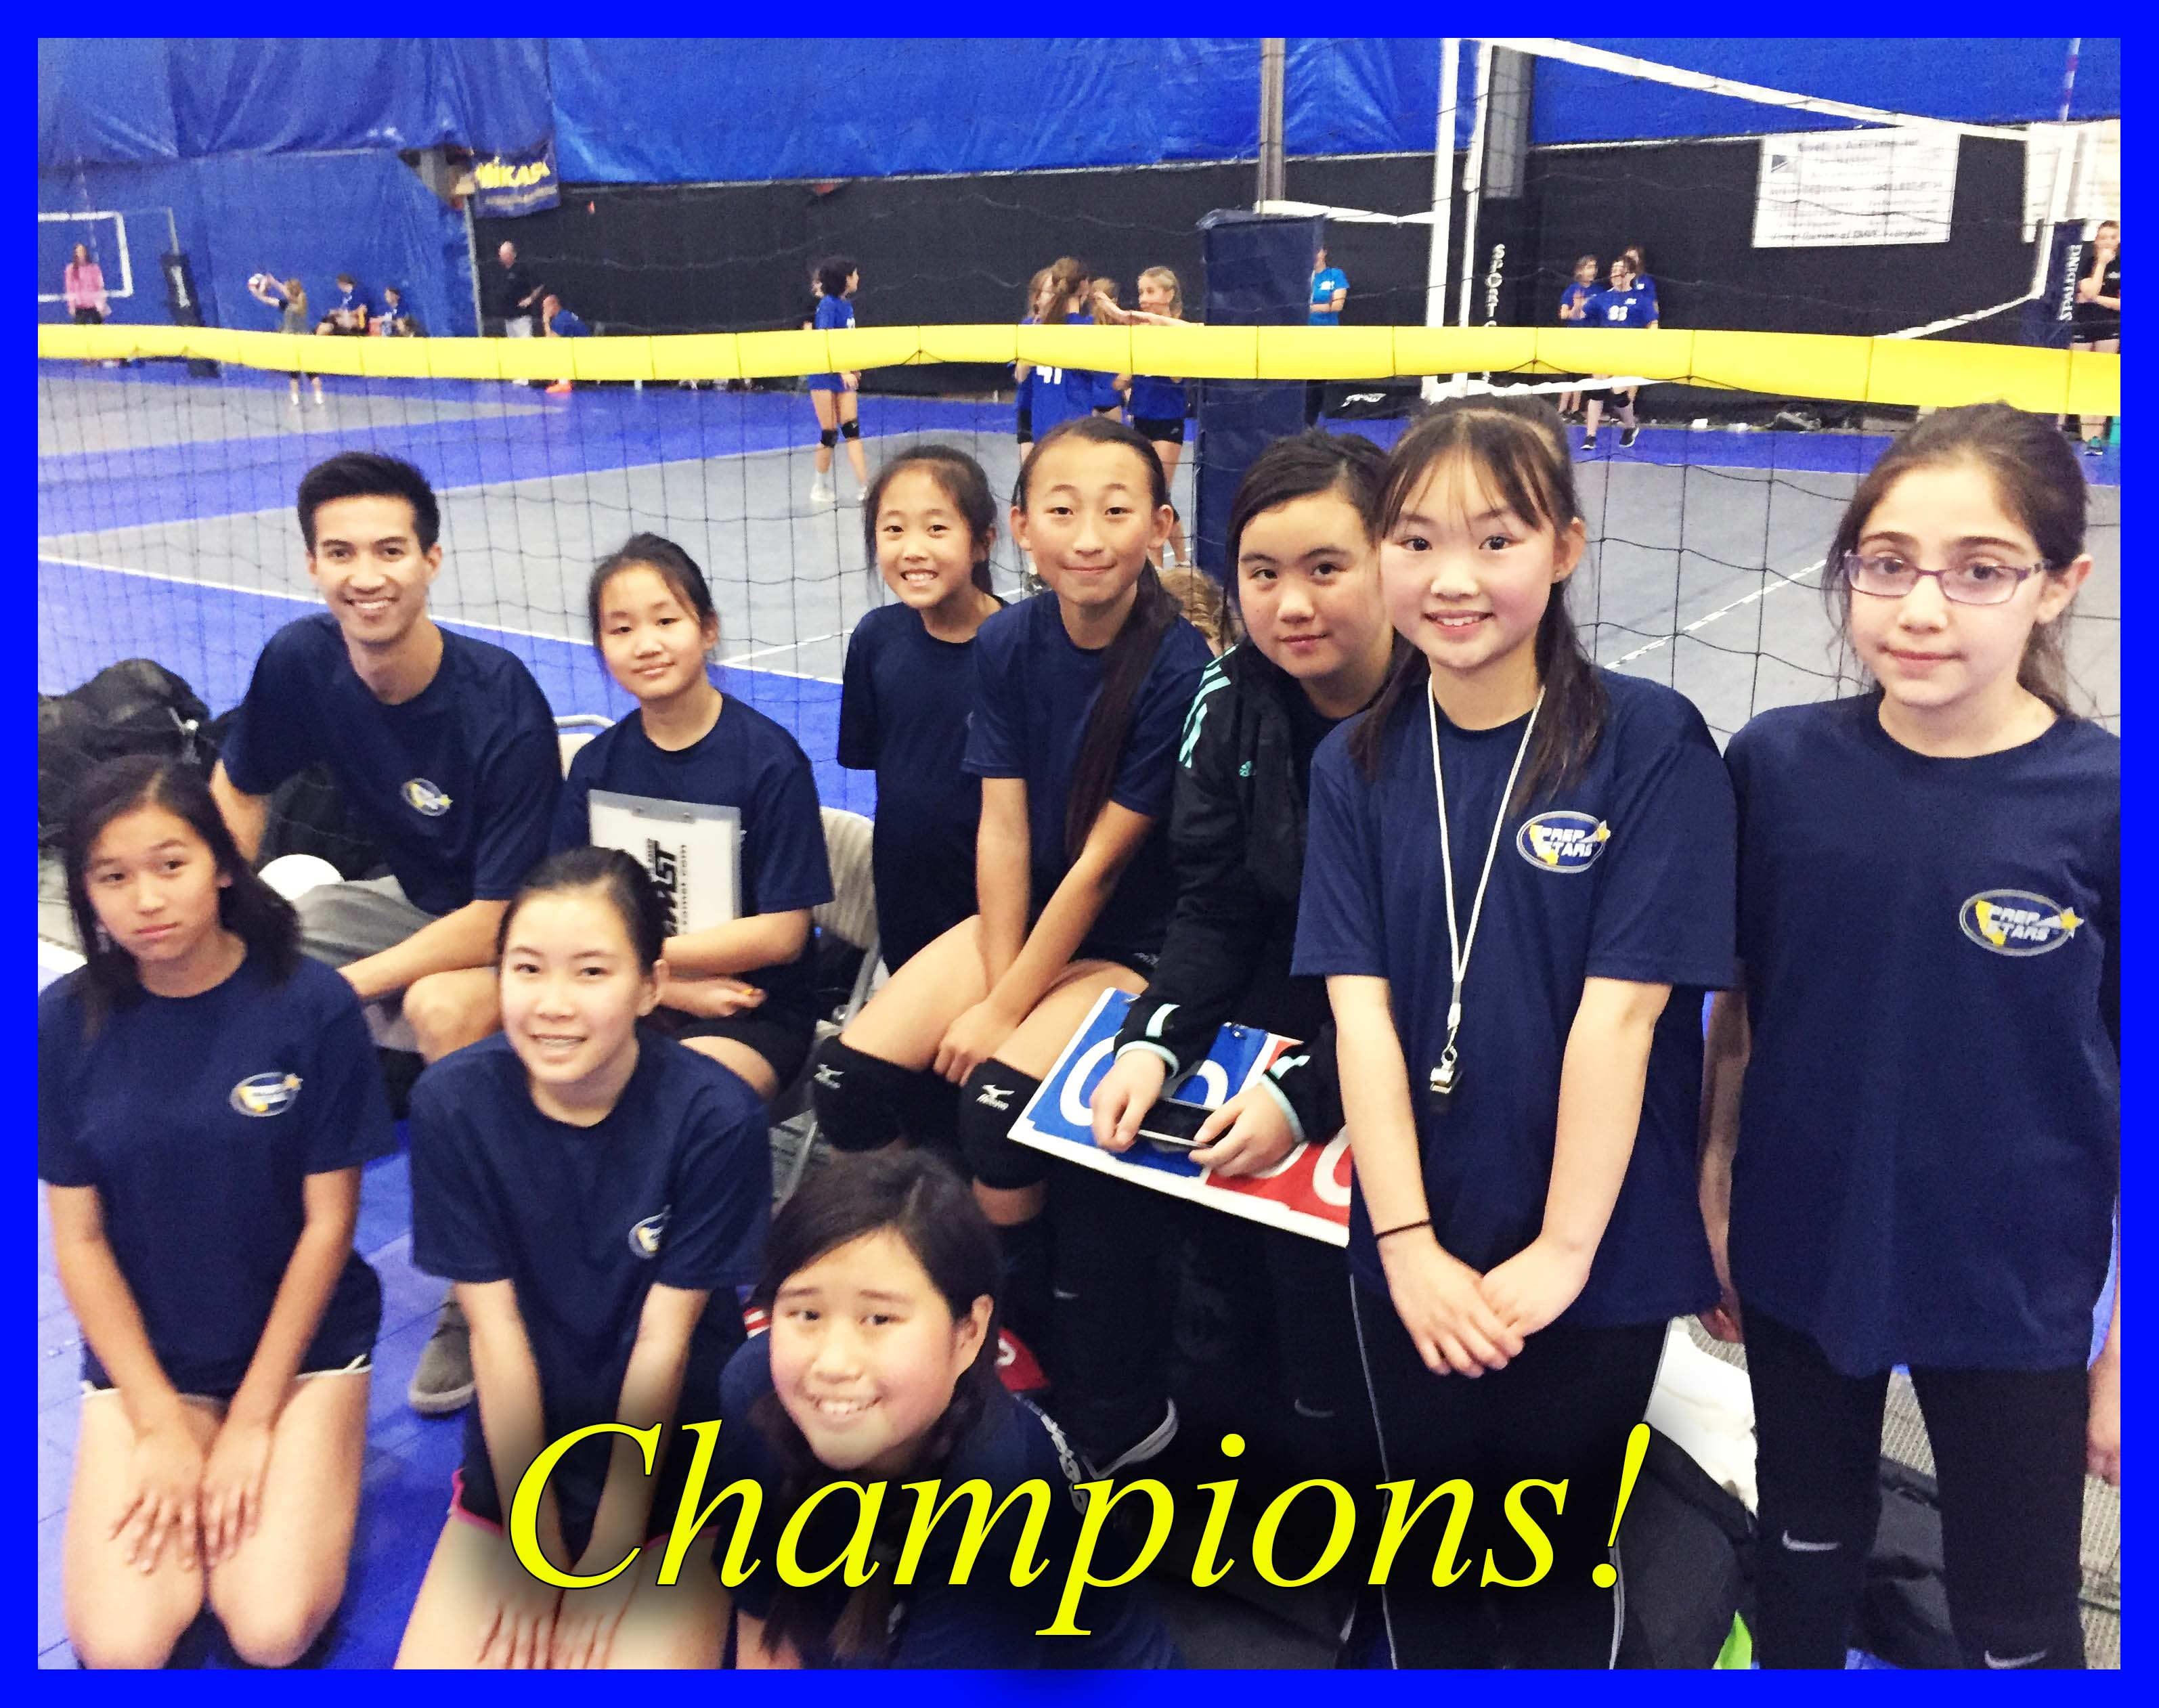 u12 Tournament Champions!